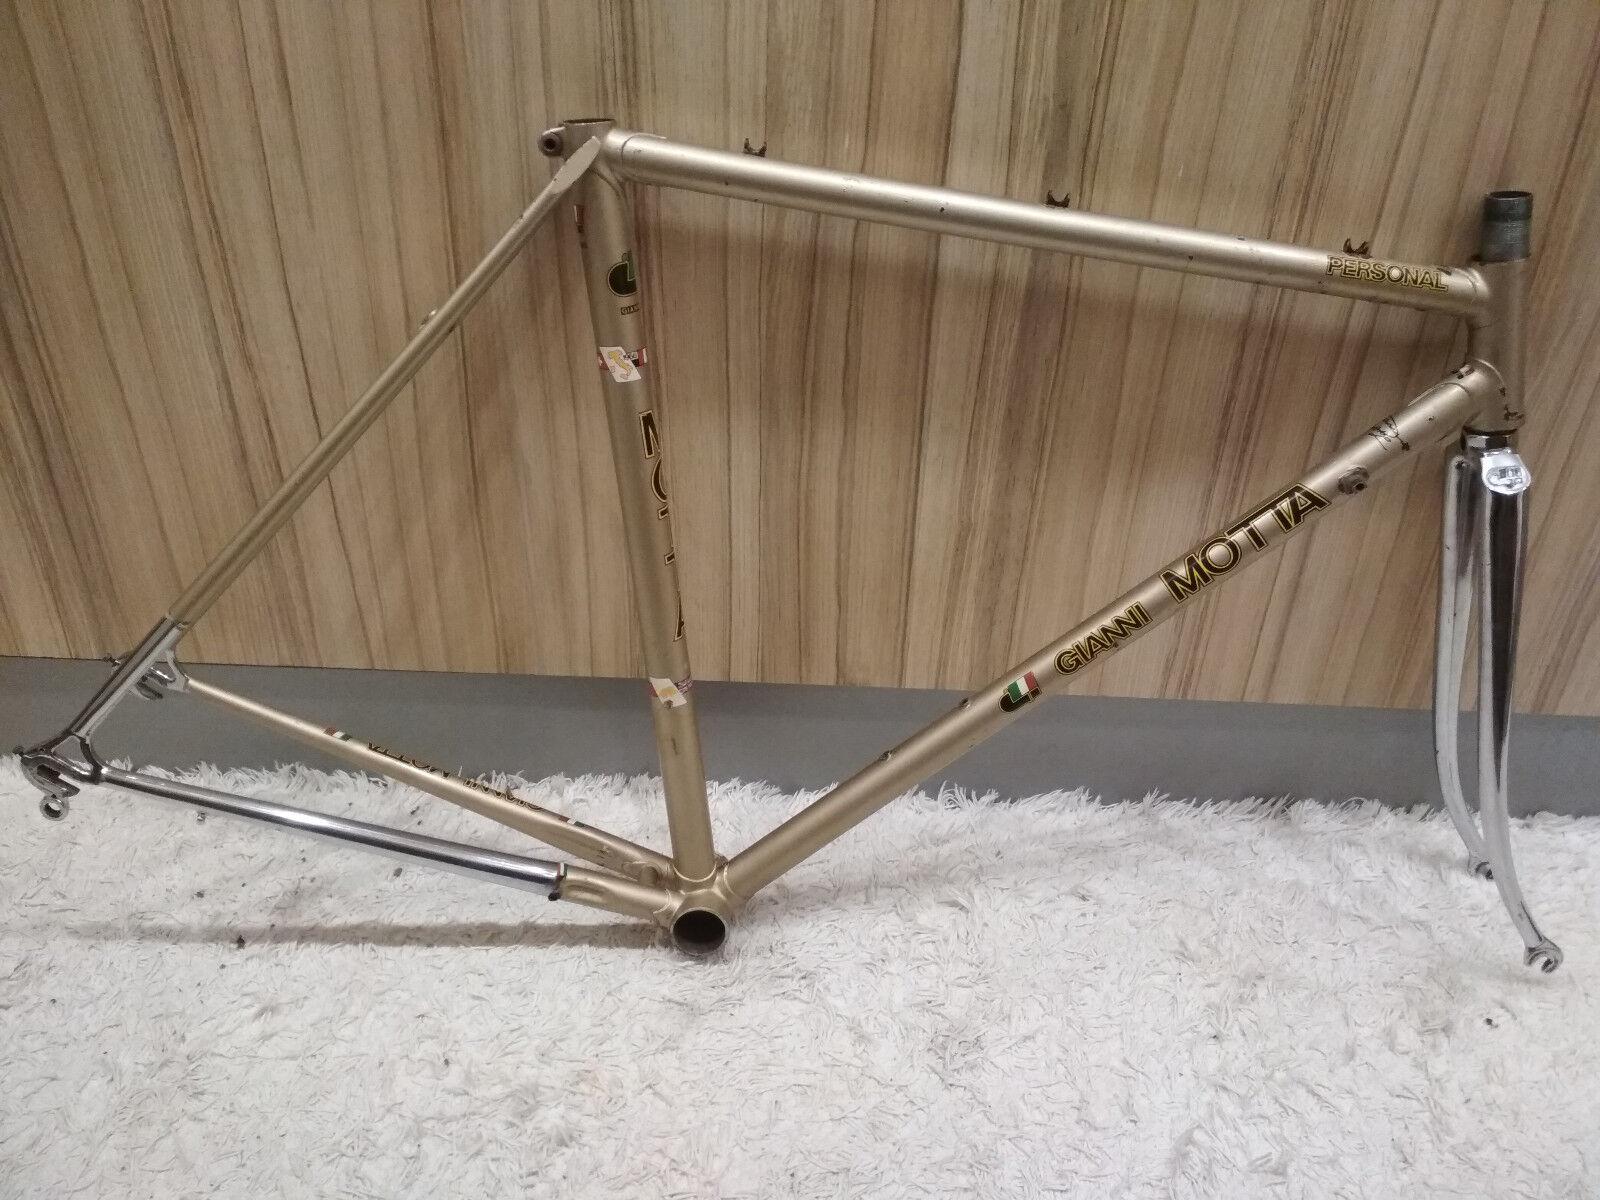 Equipo De Bicicleta Vintage Gianni Motta personal marco tarde podrían oroen 52x53 Rara